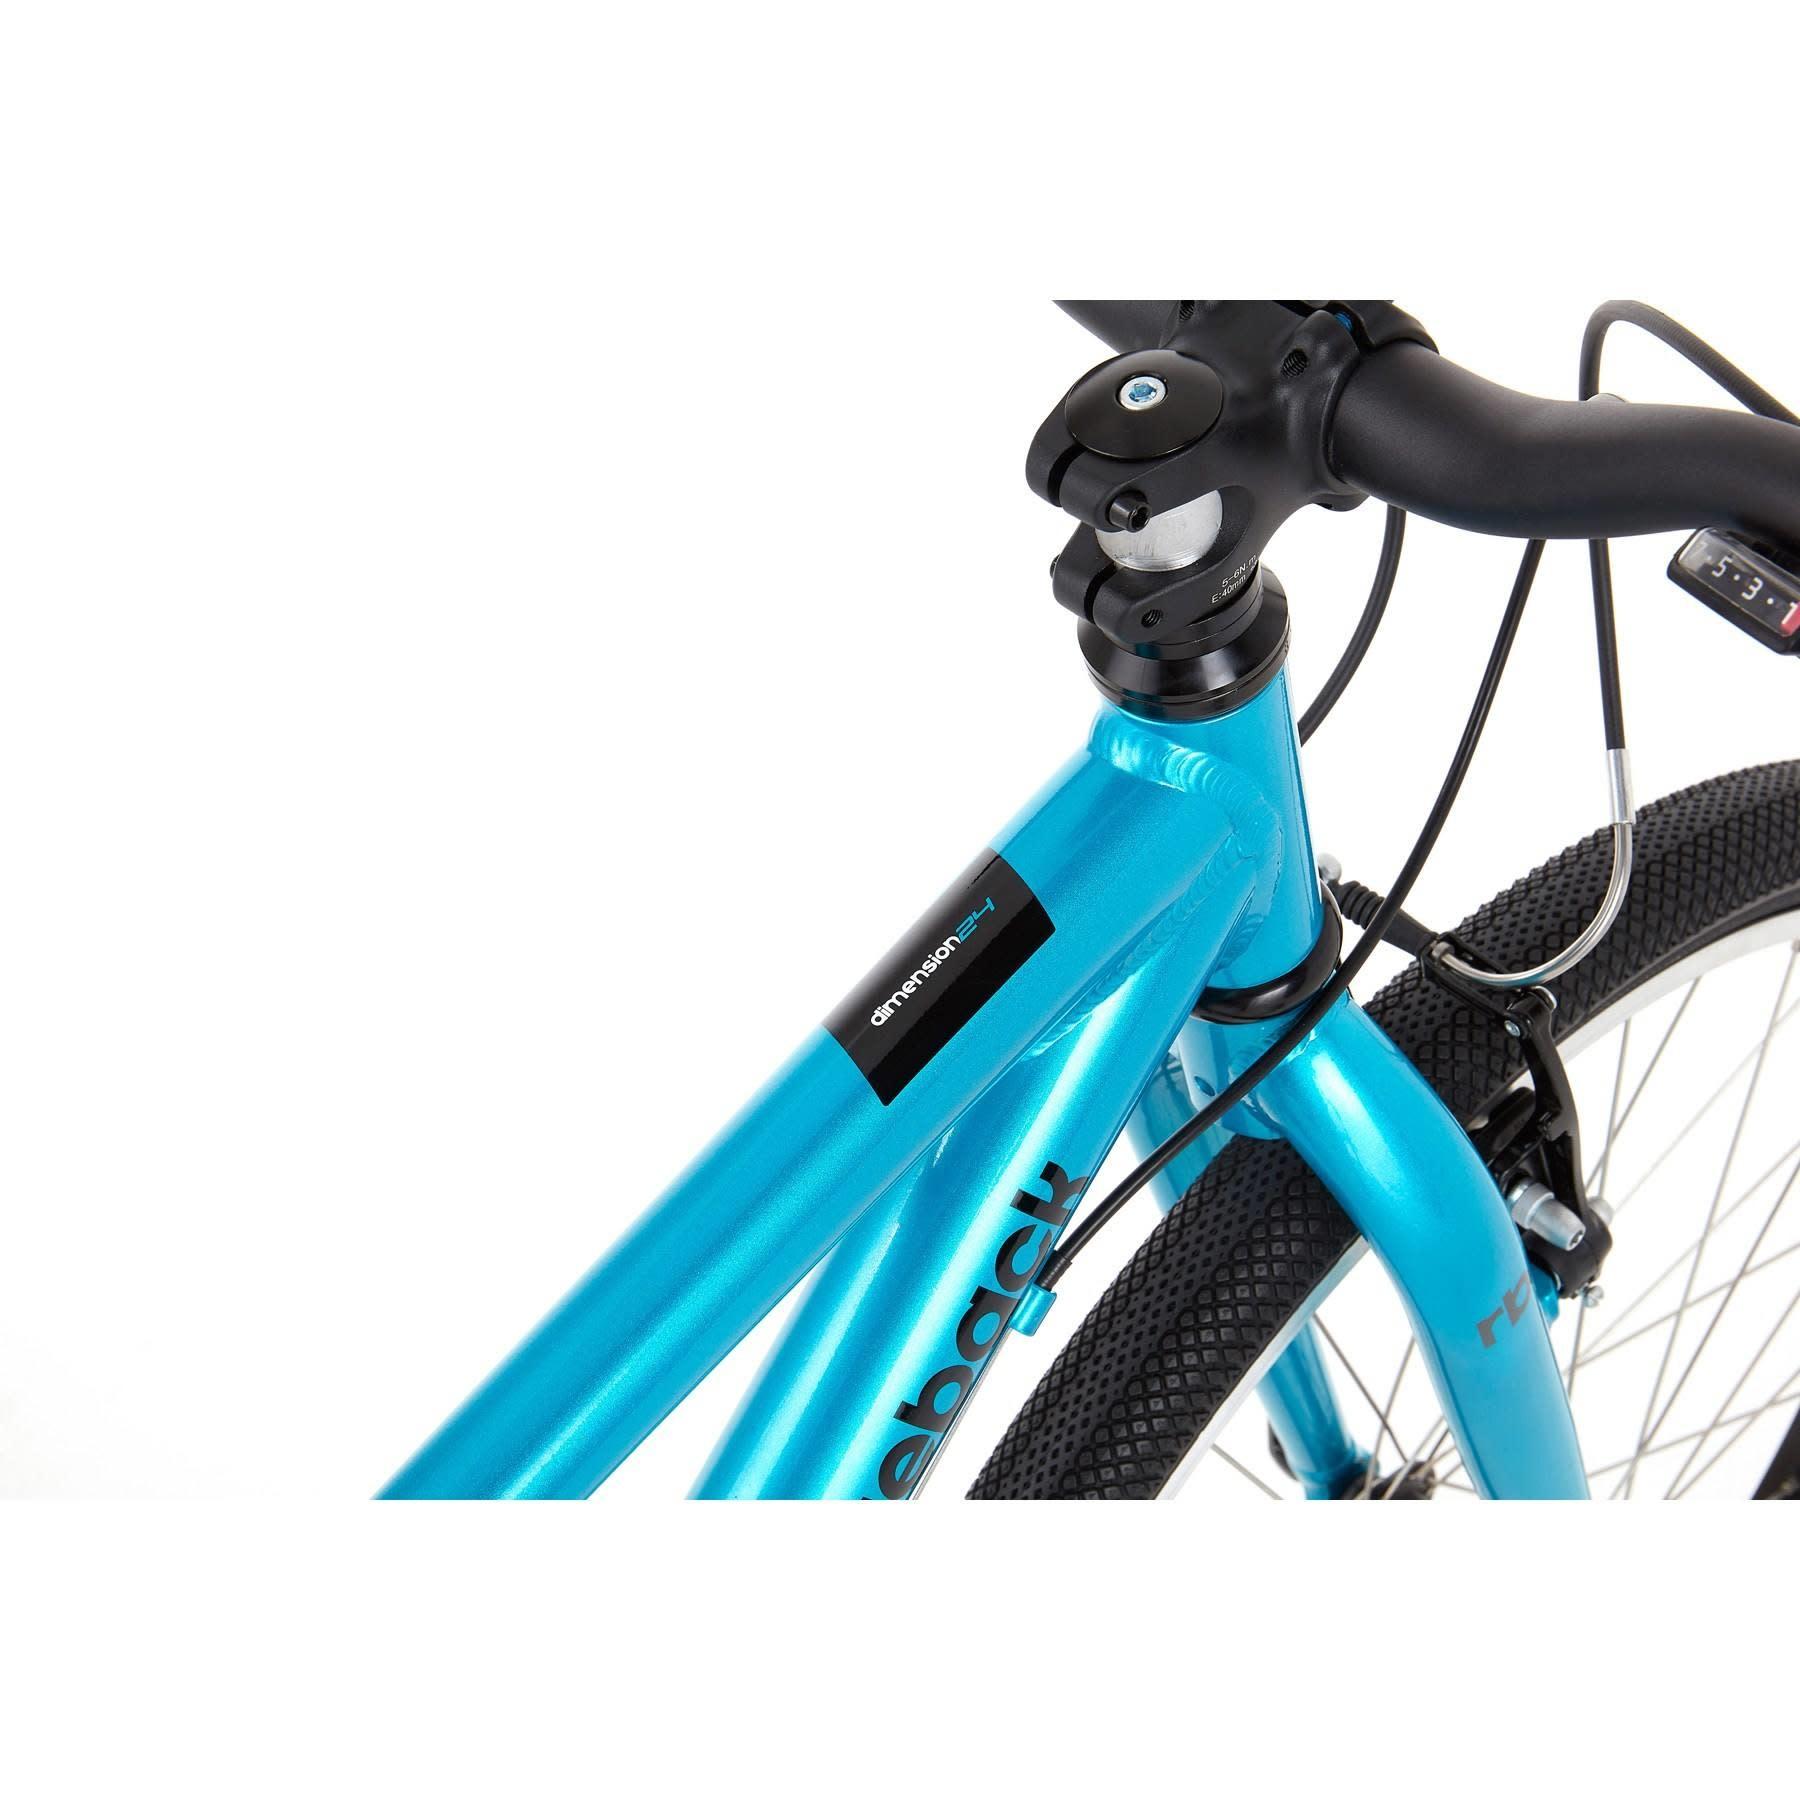 Ridgeback RIDGEBACK DIMENSION 24W 2020 BRIGHT BLUE